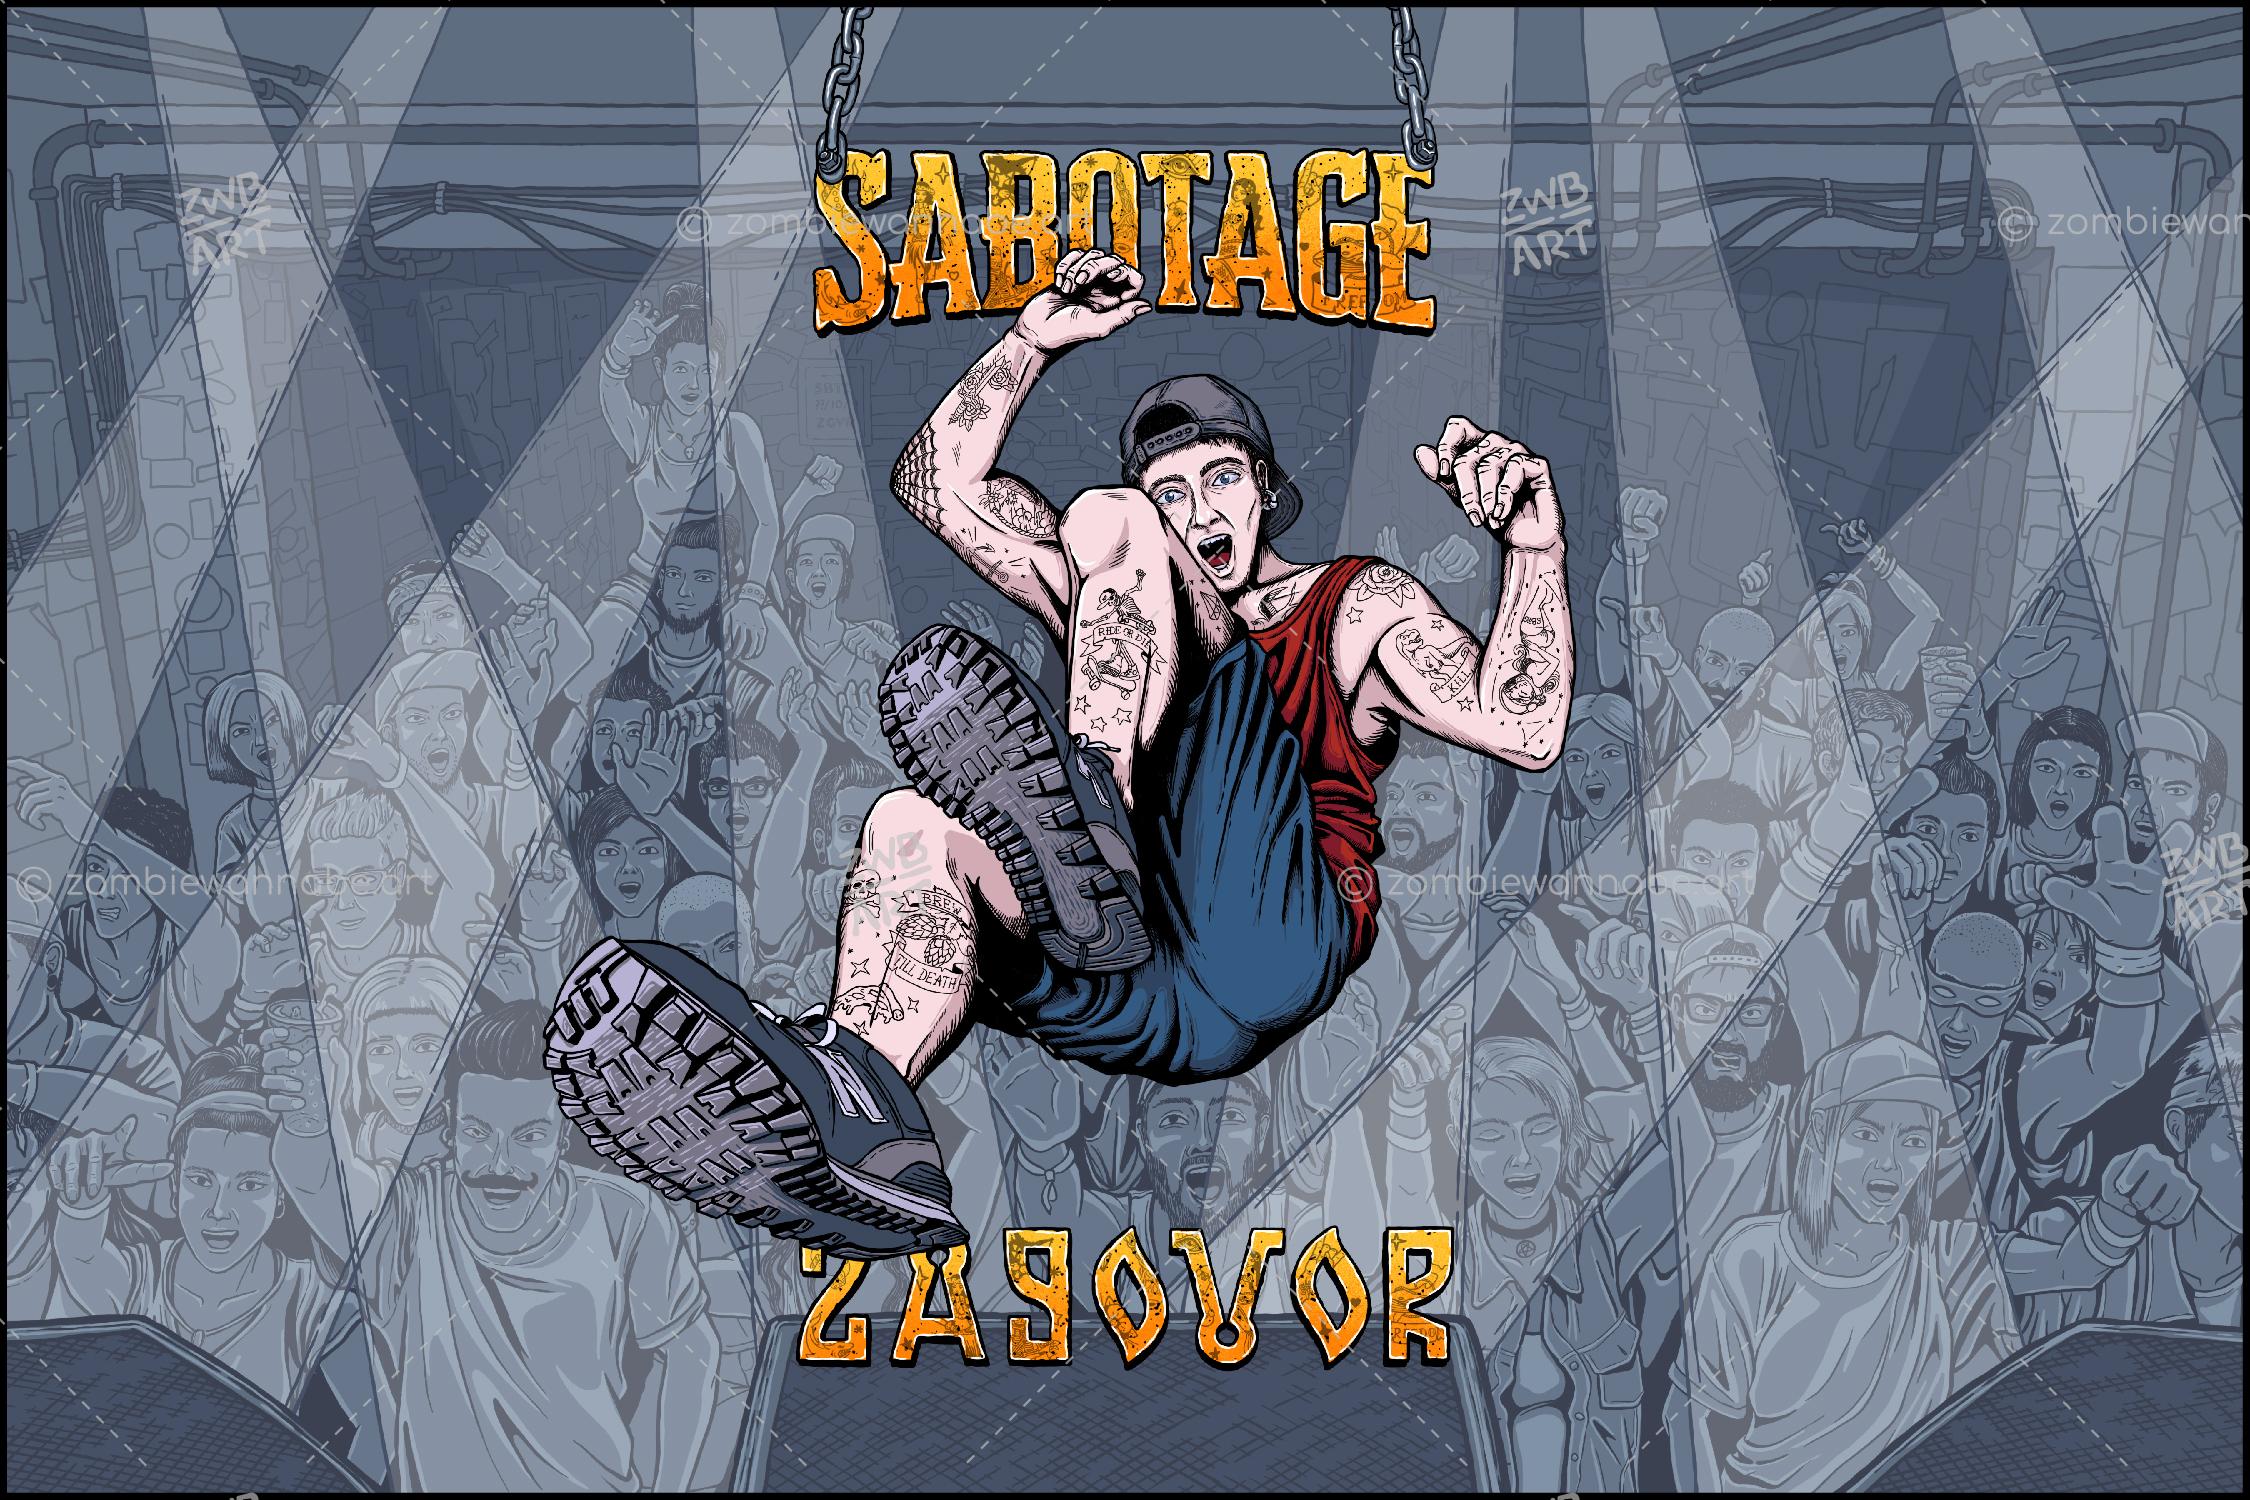 Sabotage - Stagediving - commissioned work